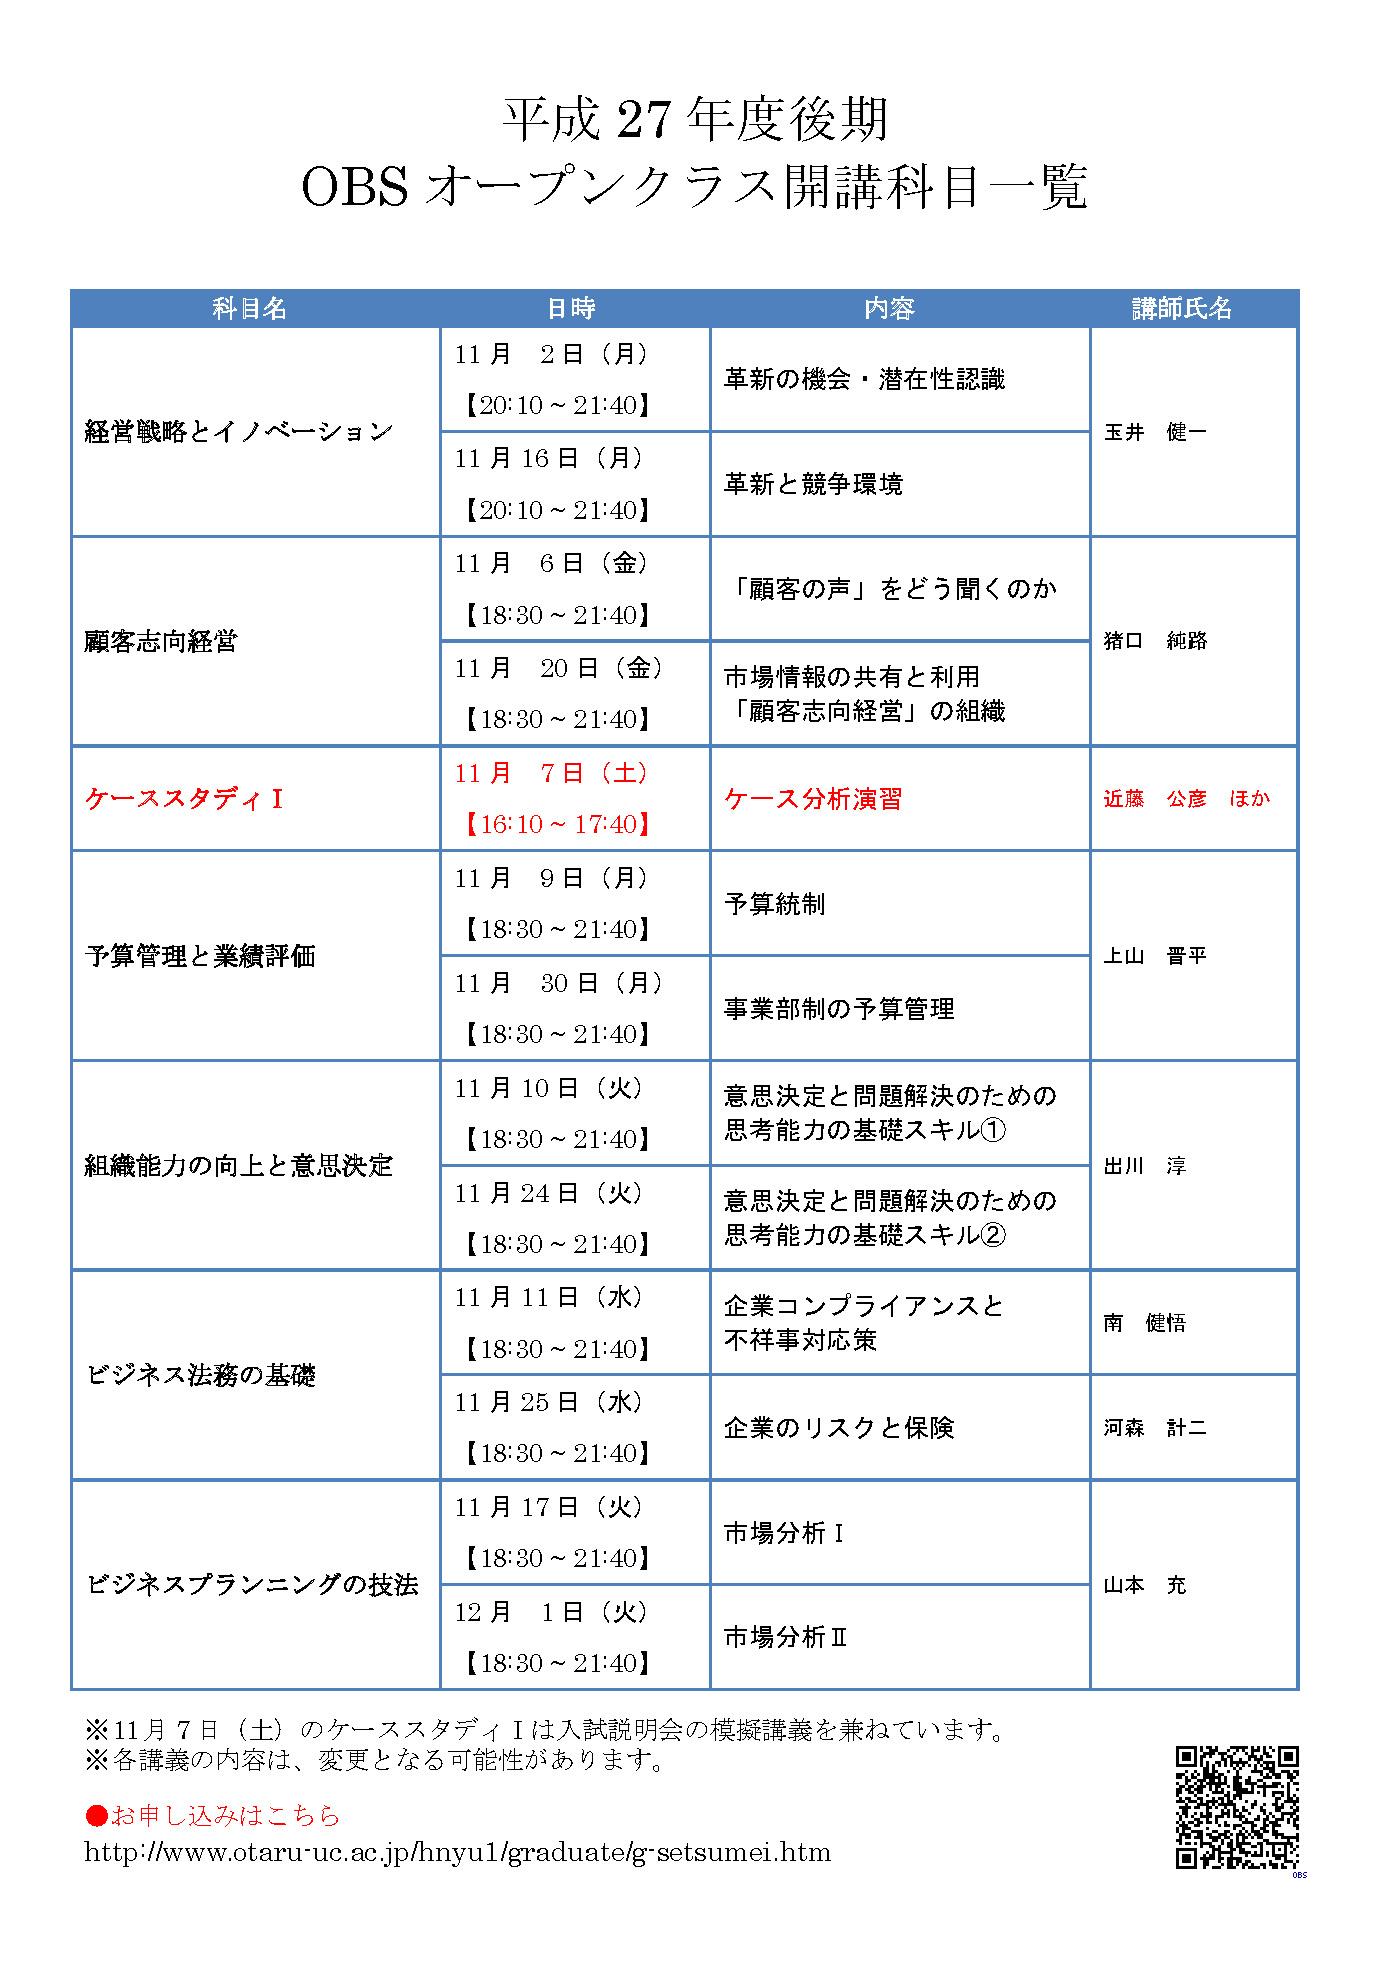 2015koukibira2.jpg